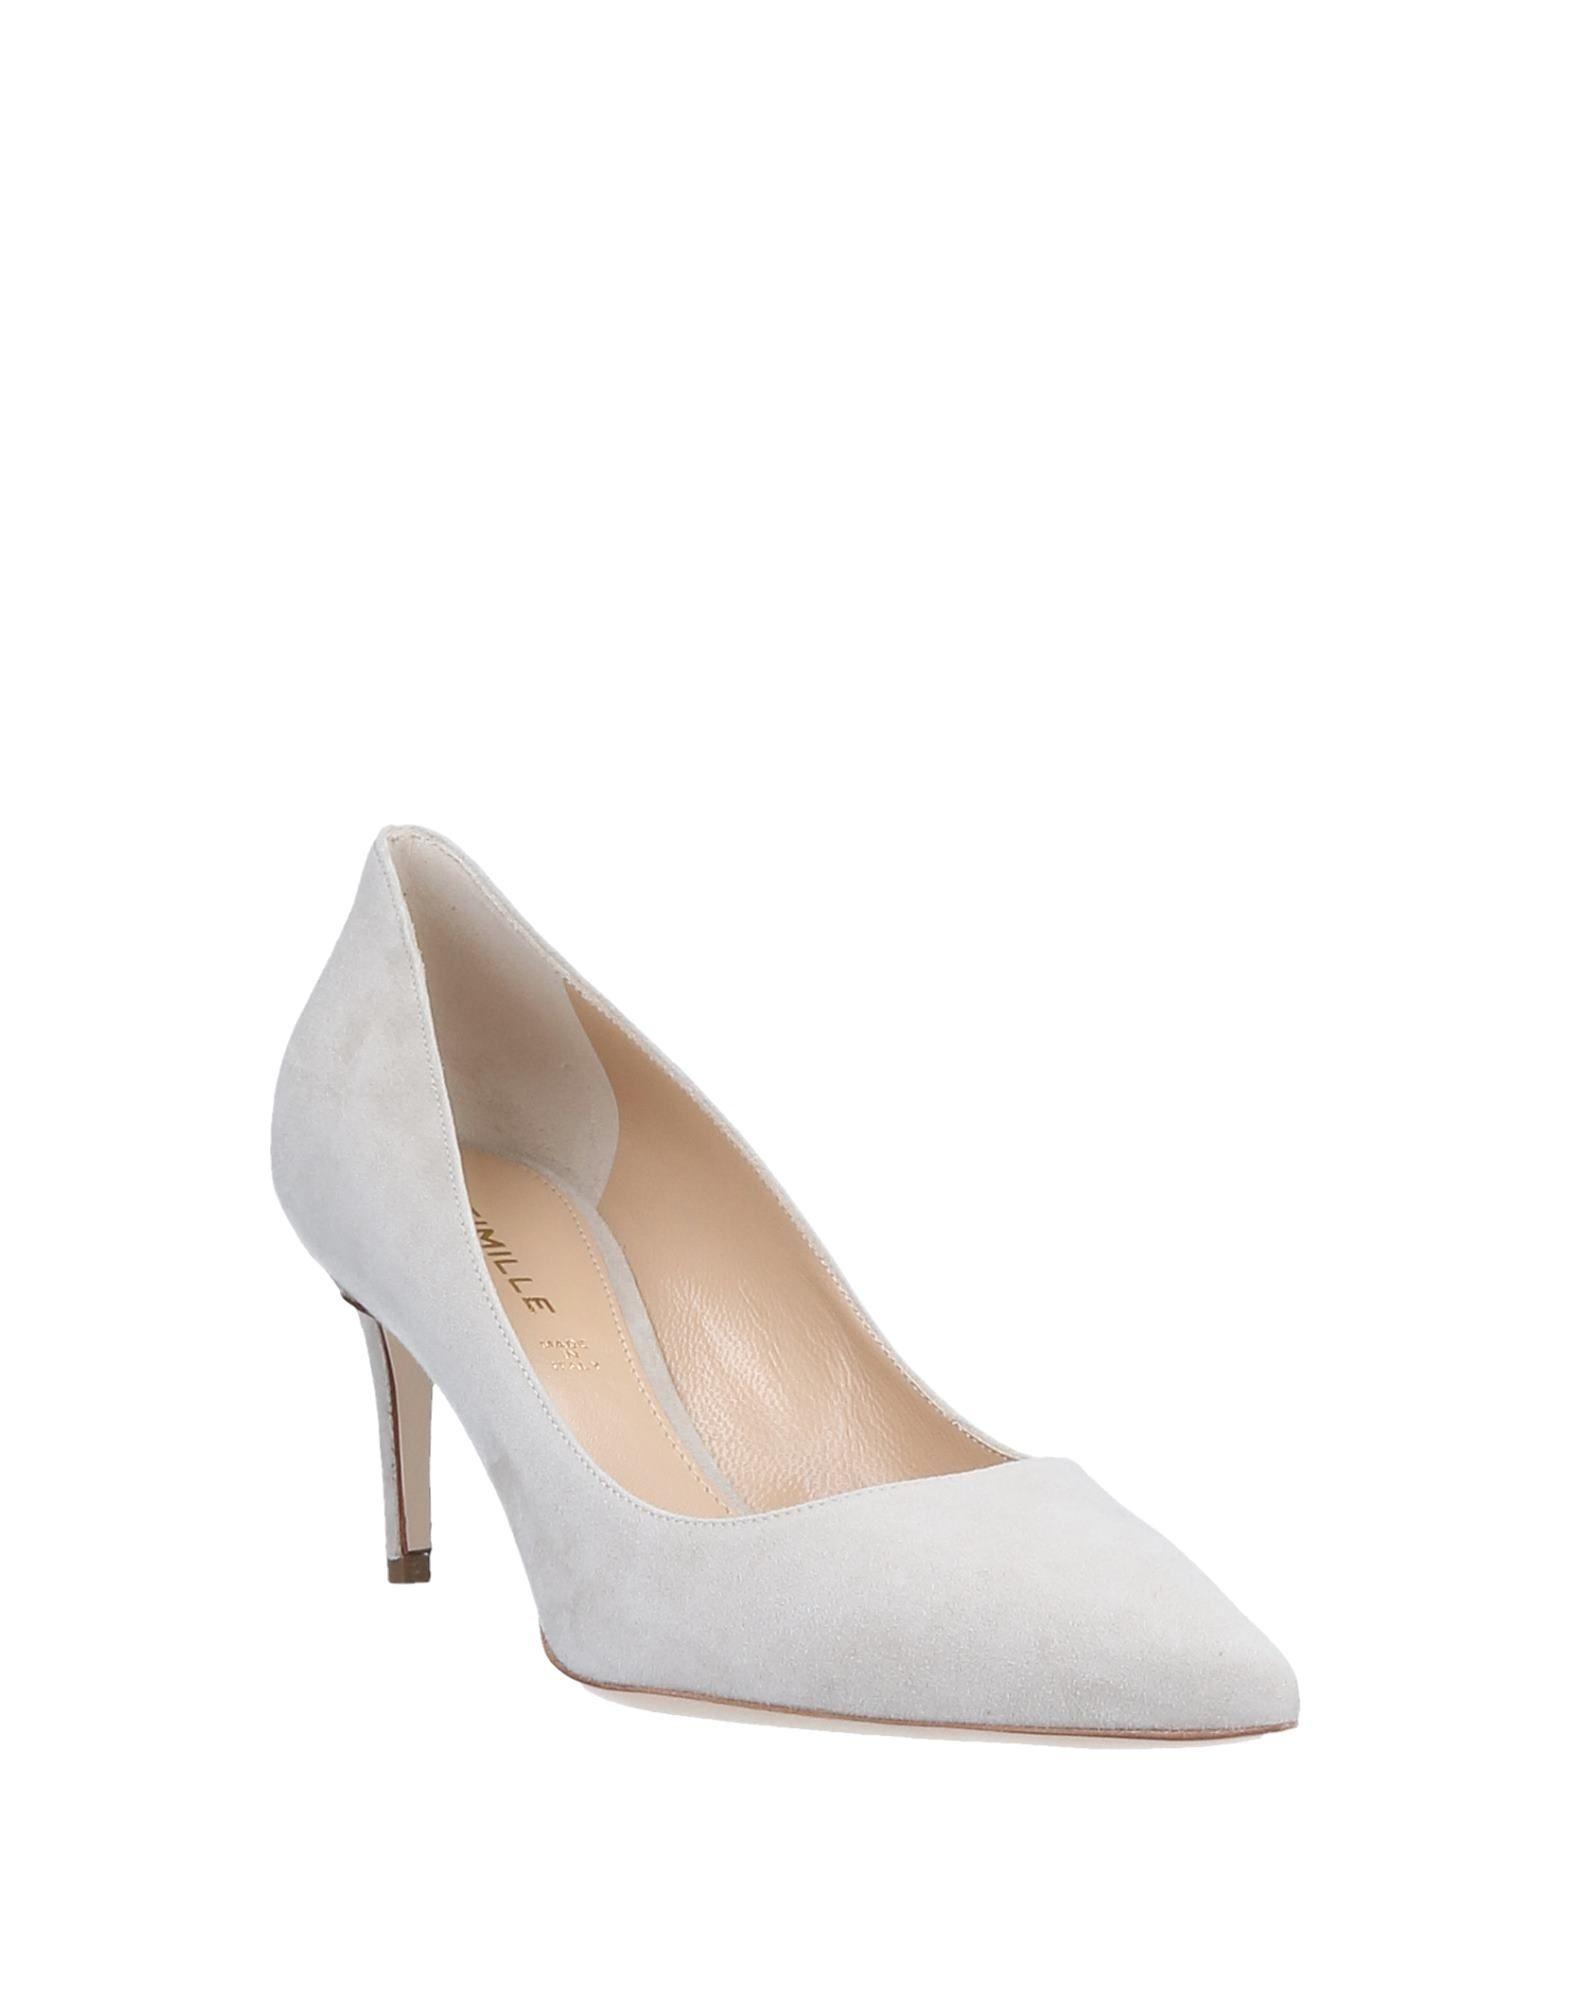 Stilvolle billige Schuhe Deimille Pumps 11481277CT Damen  11481277CT Pumps 19d3bc